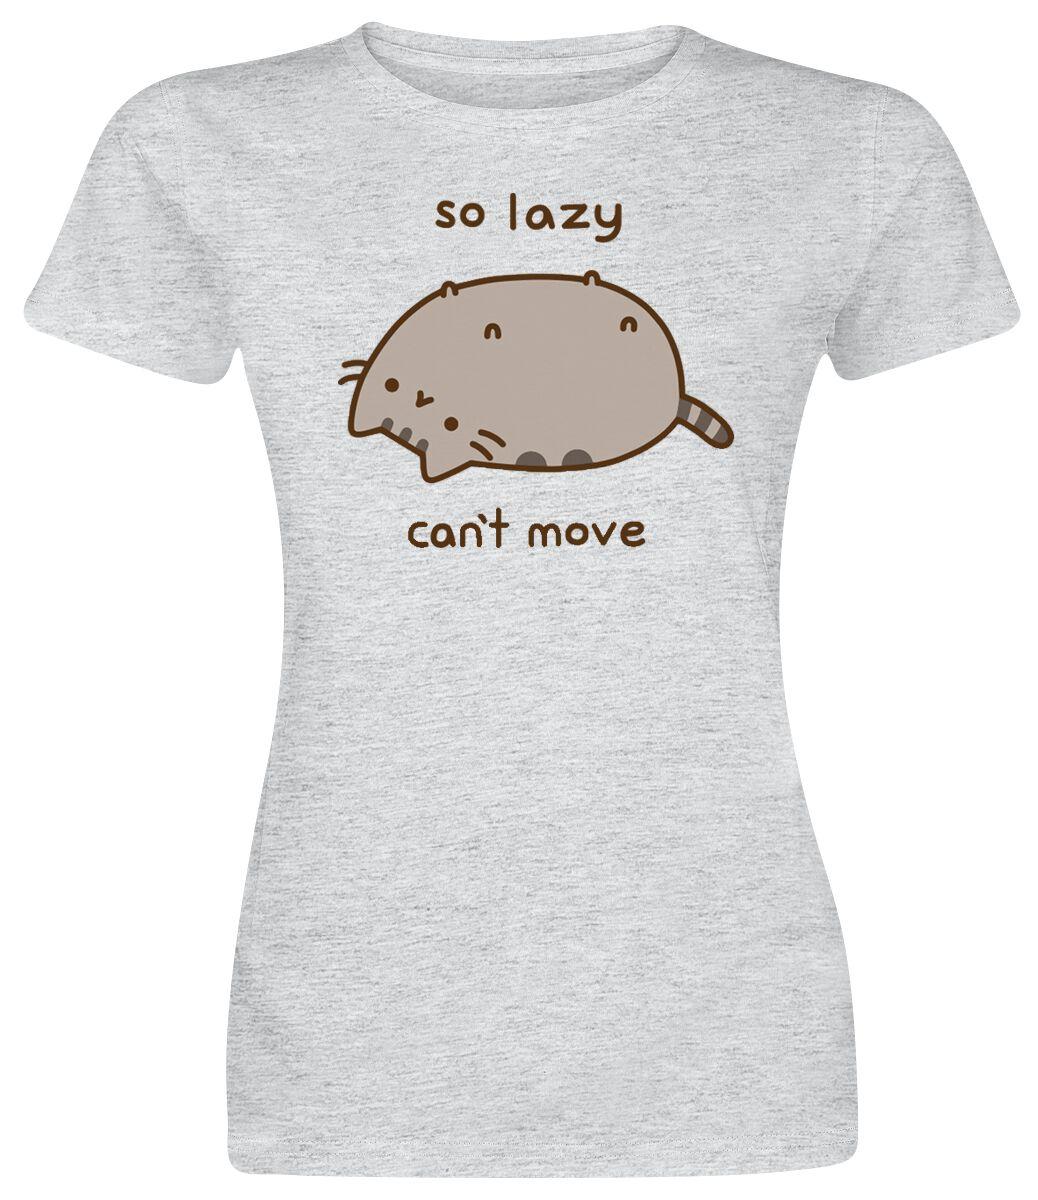 Merch dla Fanów - Koszulki - Koszulka damska Pusheen So Lazy Can't Move Koszulka damska odcienie jasnoszarego - 341290